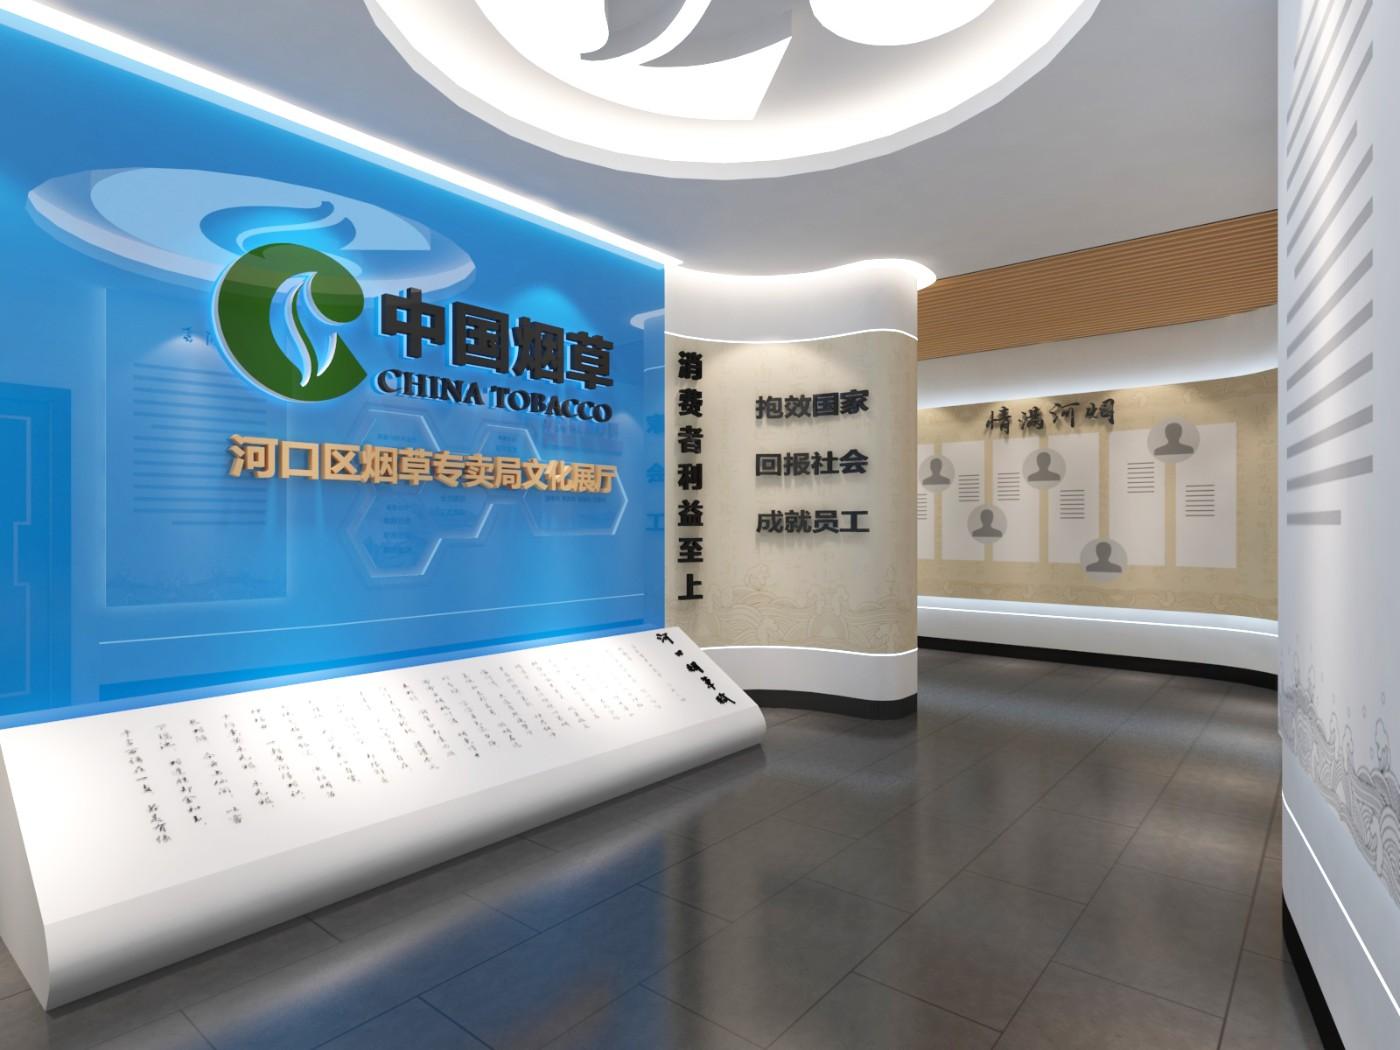 中國煙草辦公室<a href='http://www.6bubu.com/service/kongjiansheji/' title='' style='color:;font-weight:bold'>空間設計</a>6F展廳_08.jpg